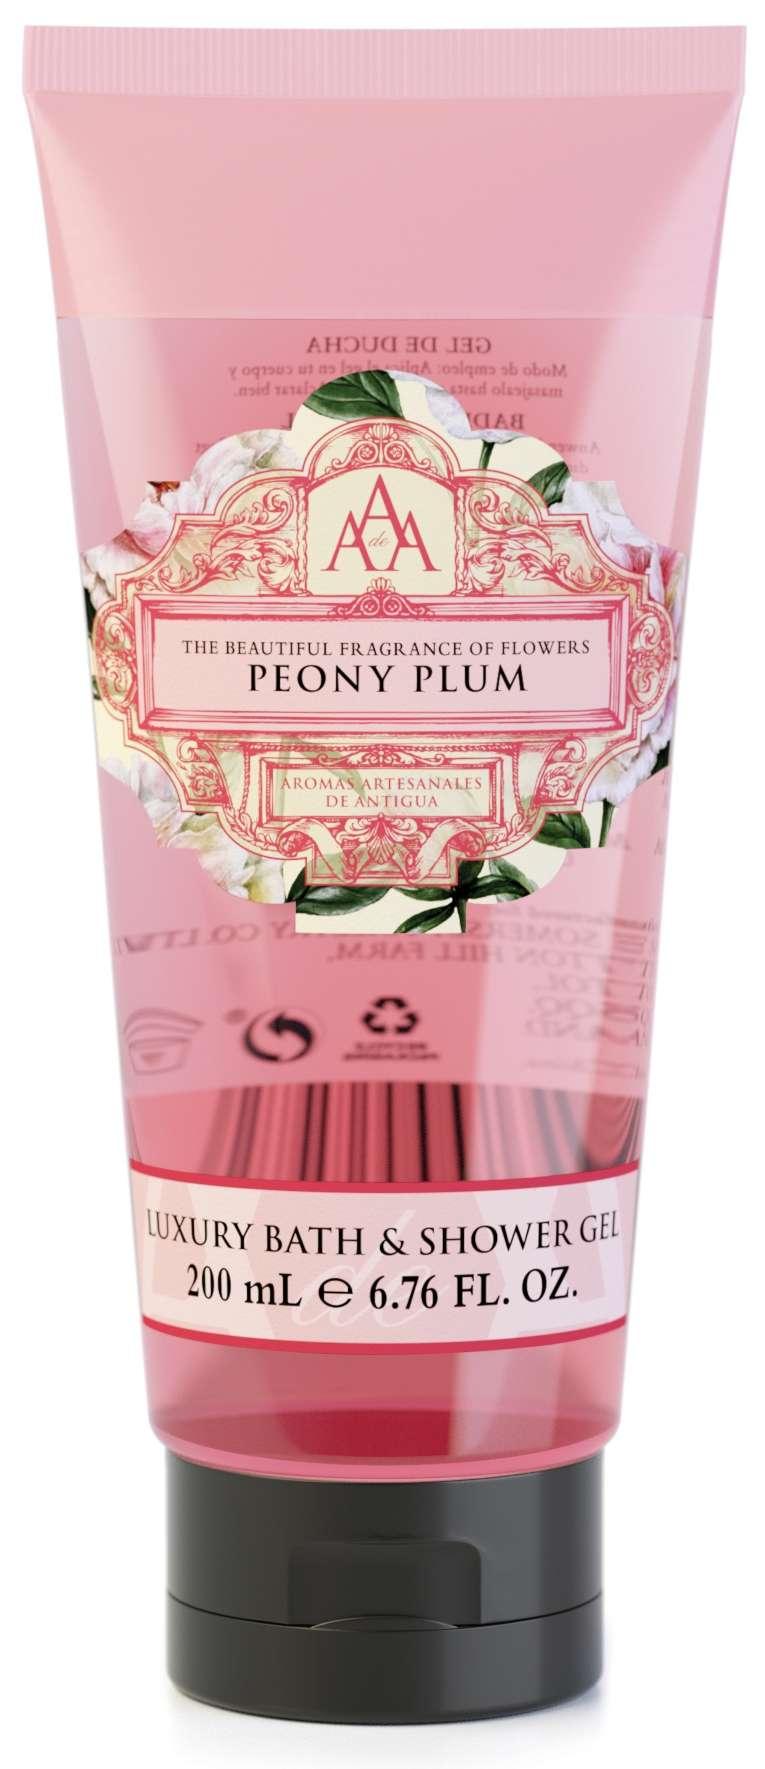 AAA Bath & Shower Gel Peony Plum